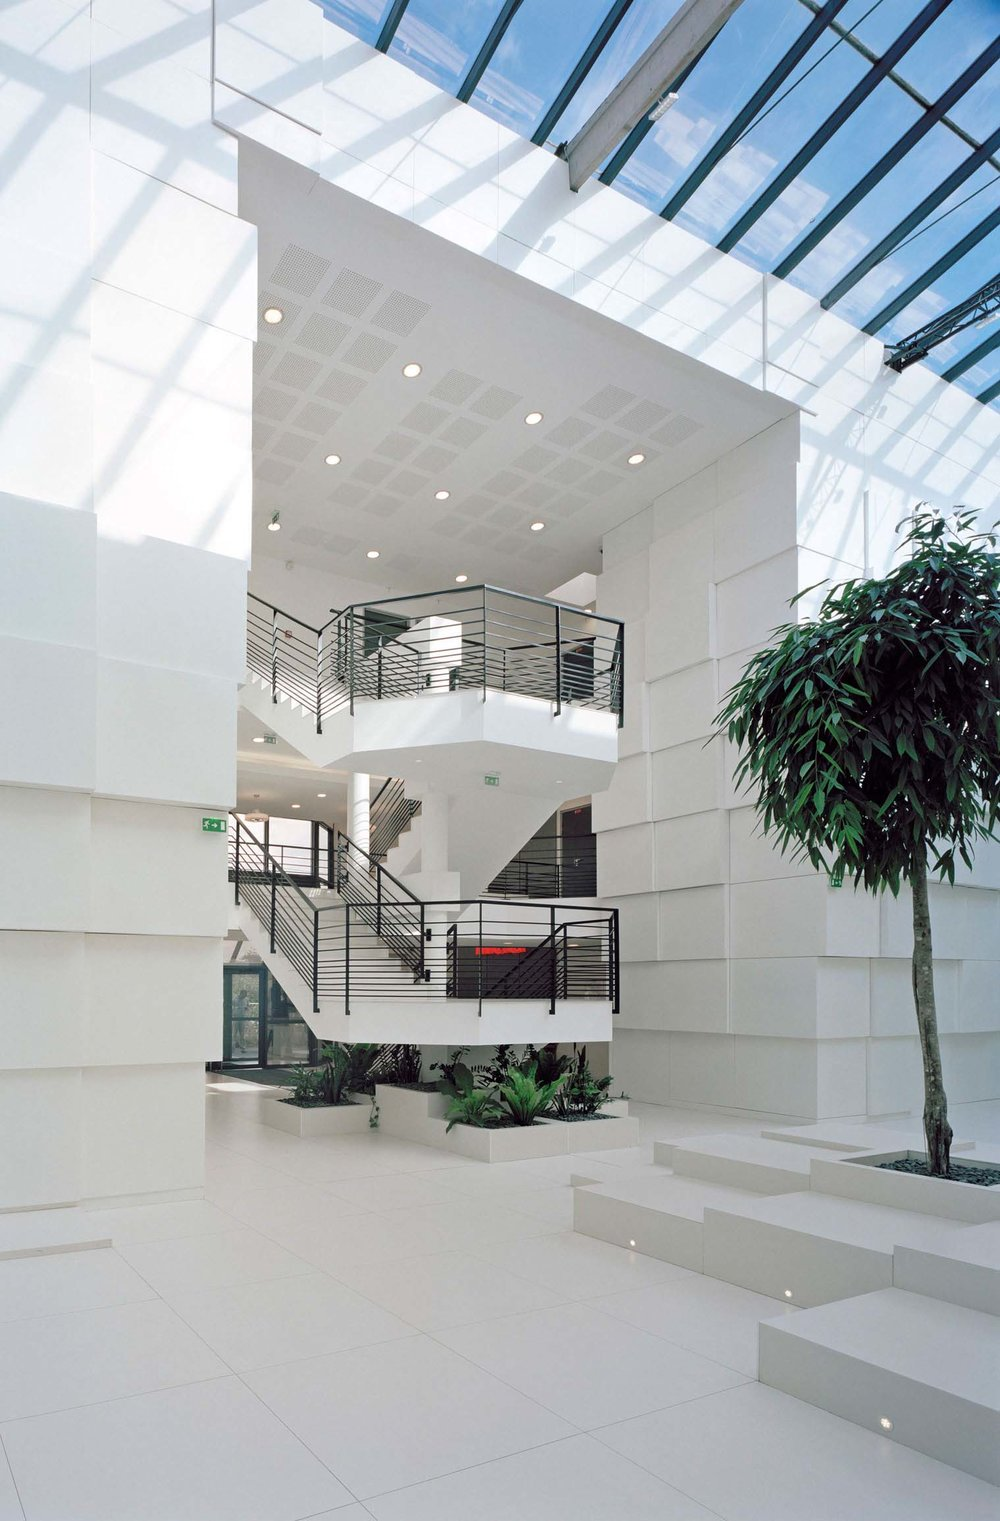 DC3 data center illiad xavier niel ar studio d'architectures (4).jpg